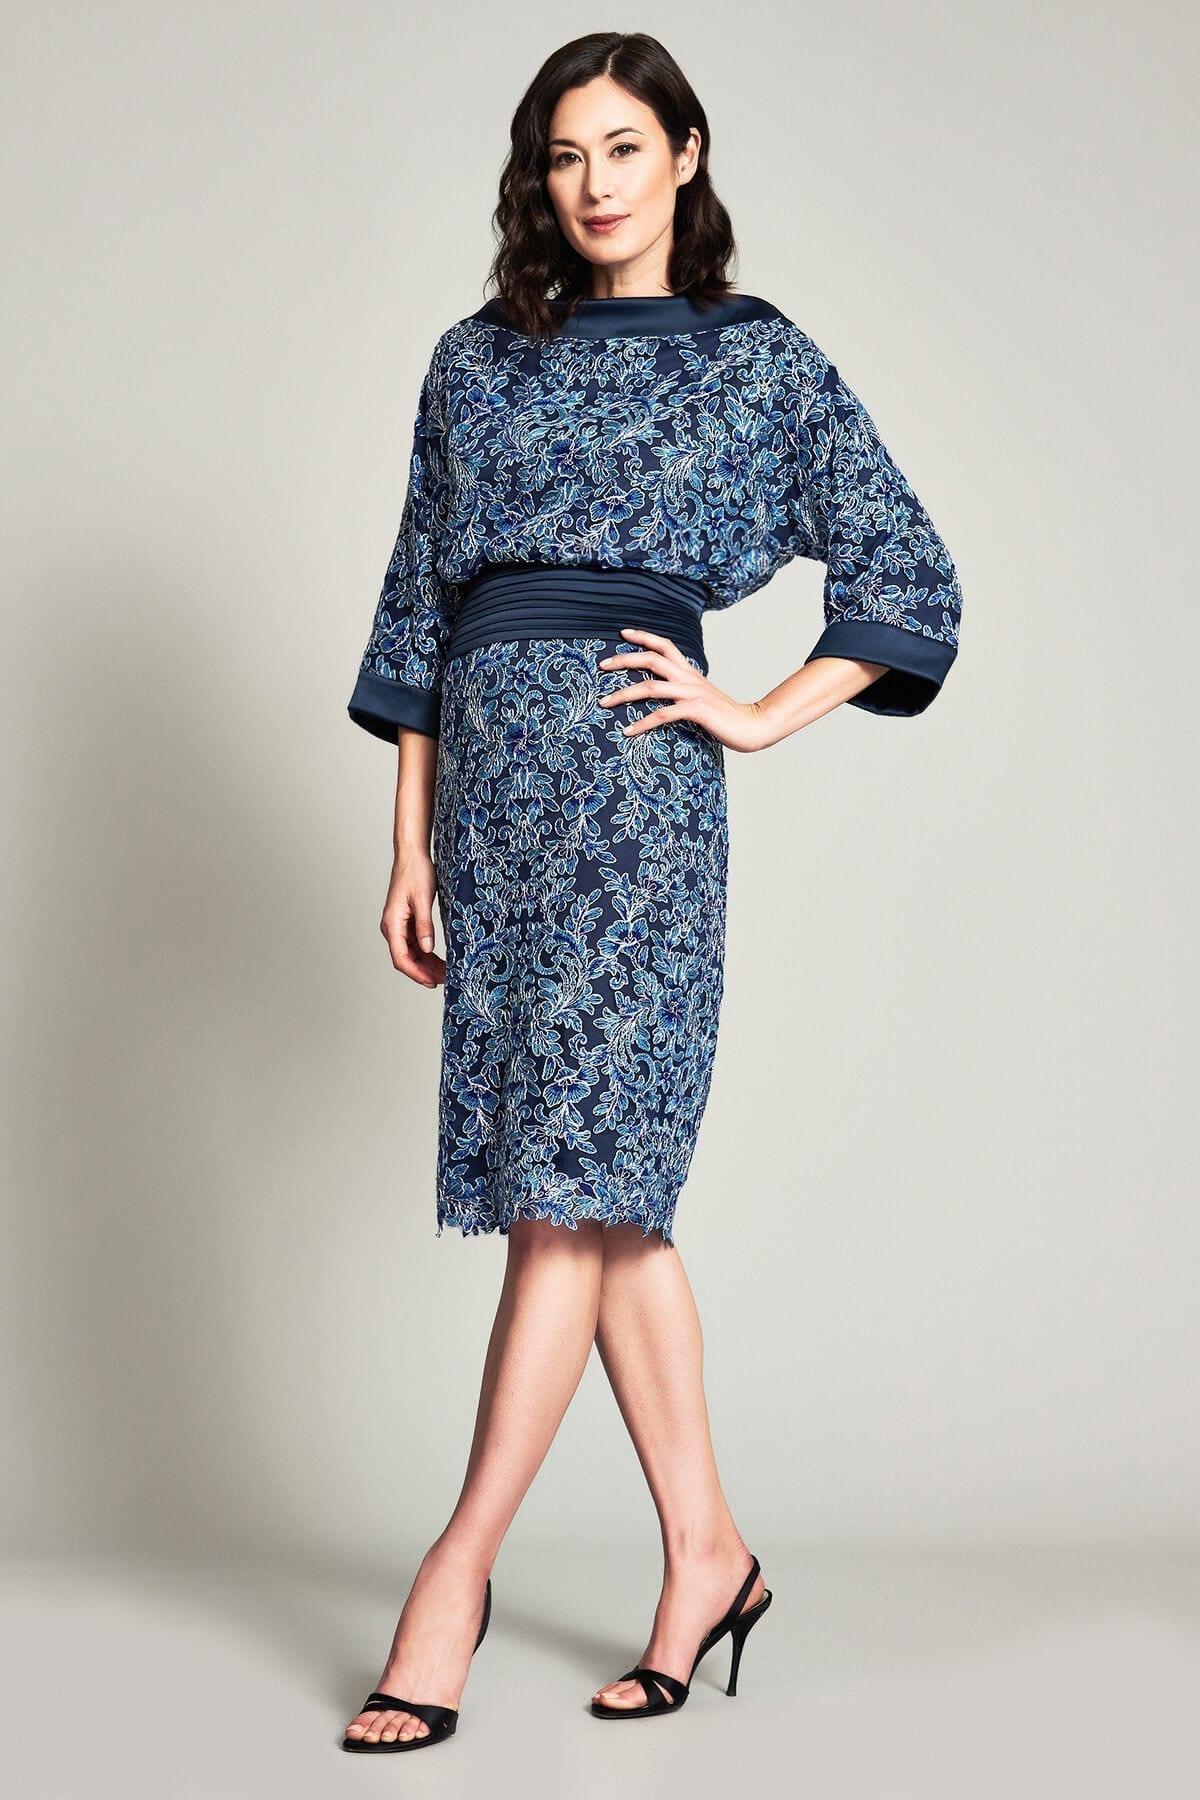 TADASHI SHOJI Mott High Neck Embroidered Dress